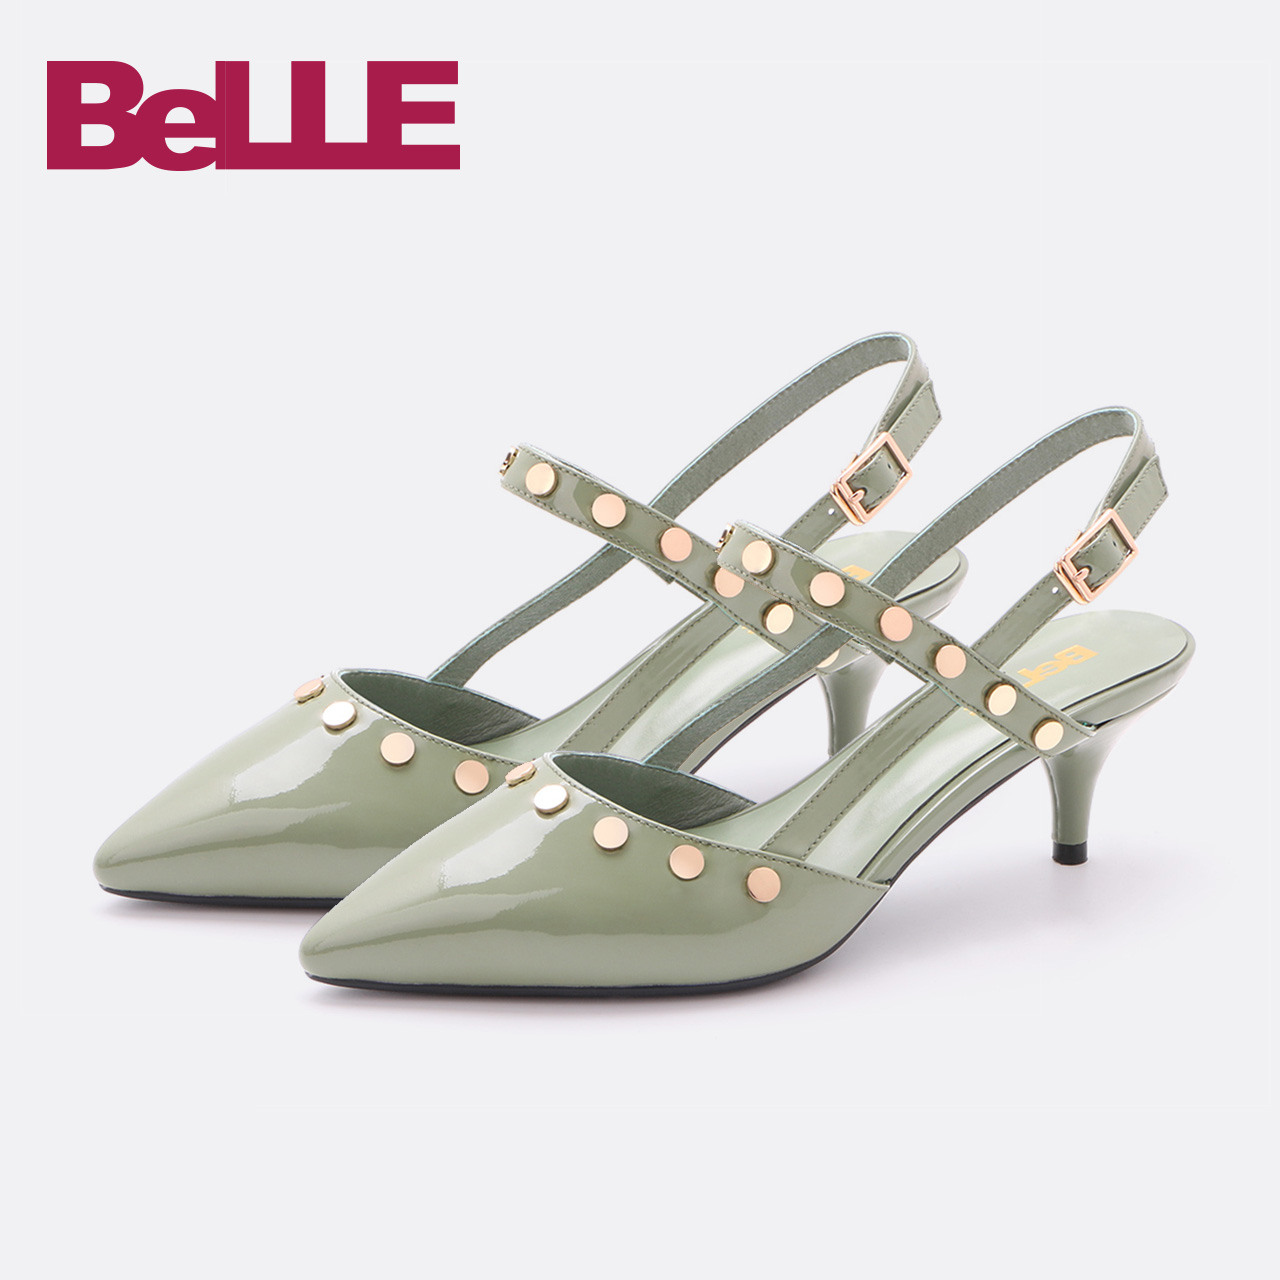 Belle-百丽凉鞋18春季新款商场同款牛漆皮细跟女鞋S4M1DAH8